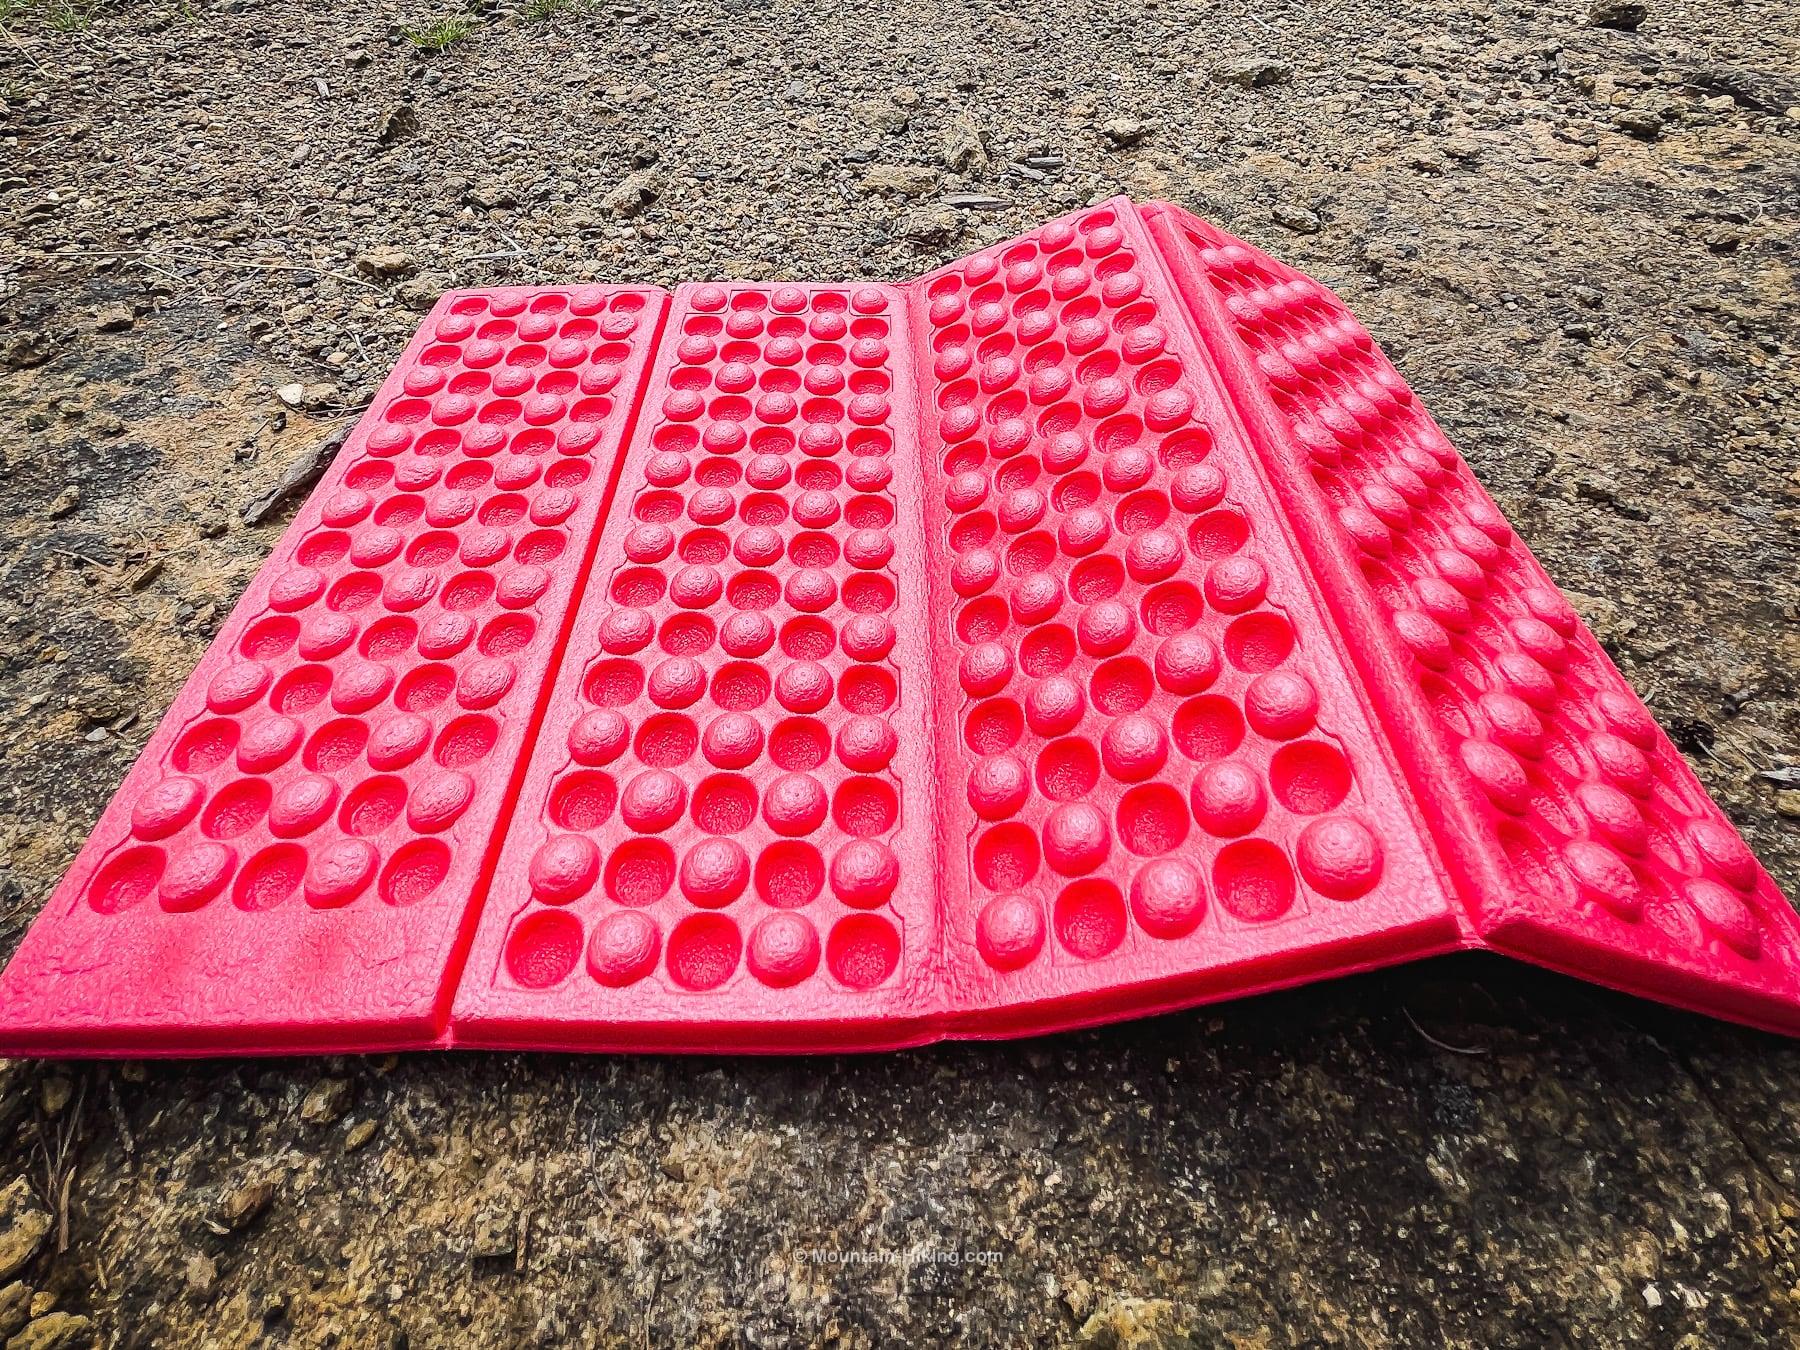 pink sit pad on lumpy rock